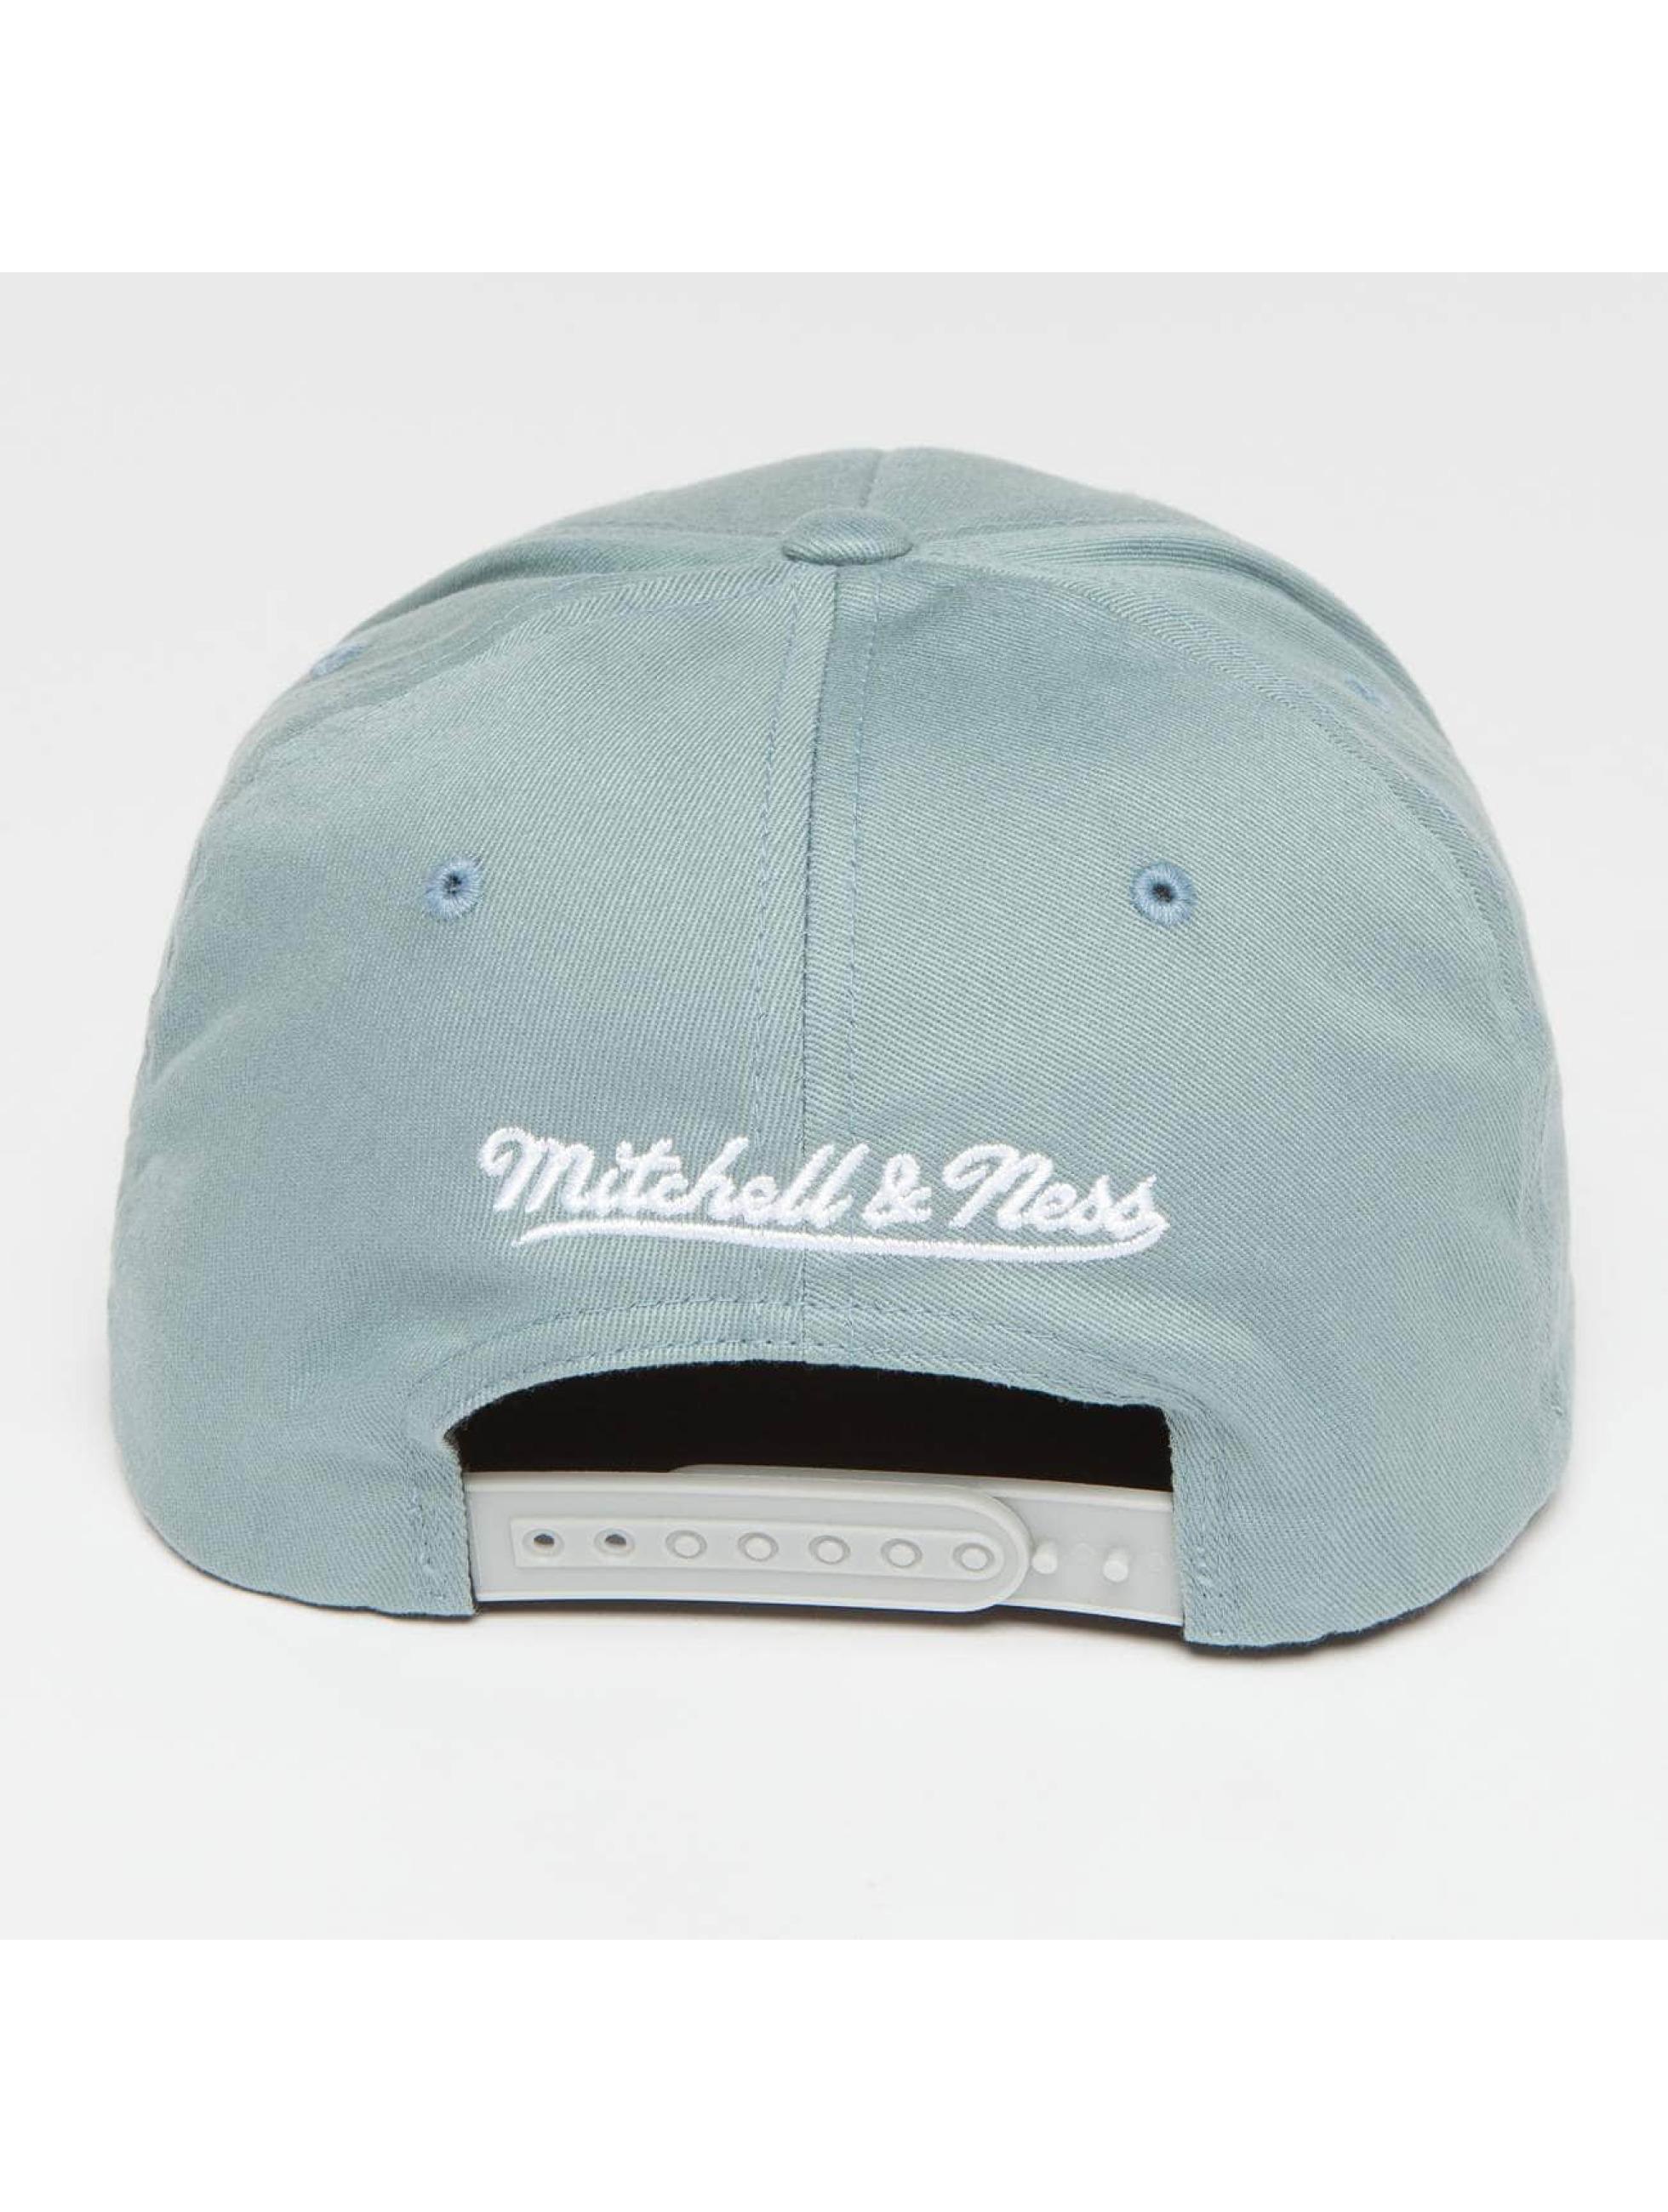 Mitchell & Ness Gorra Snapback Own Brand Pinscript High Crown 110 azul